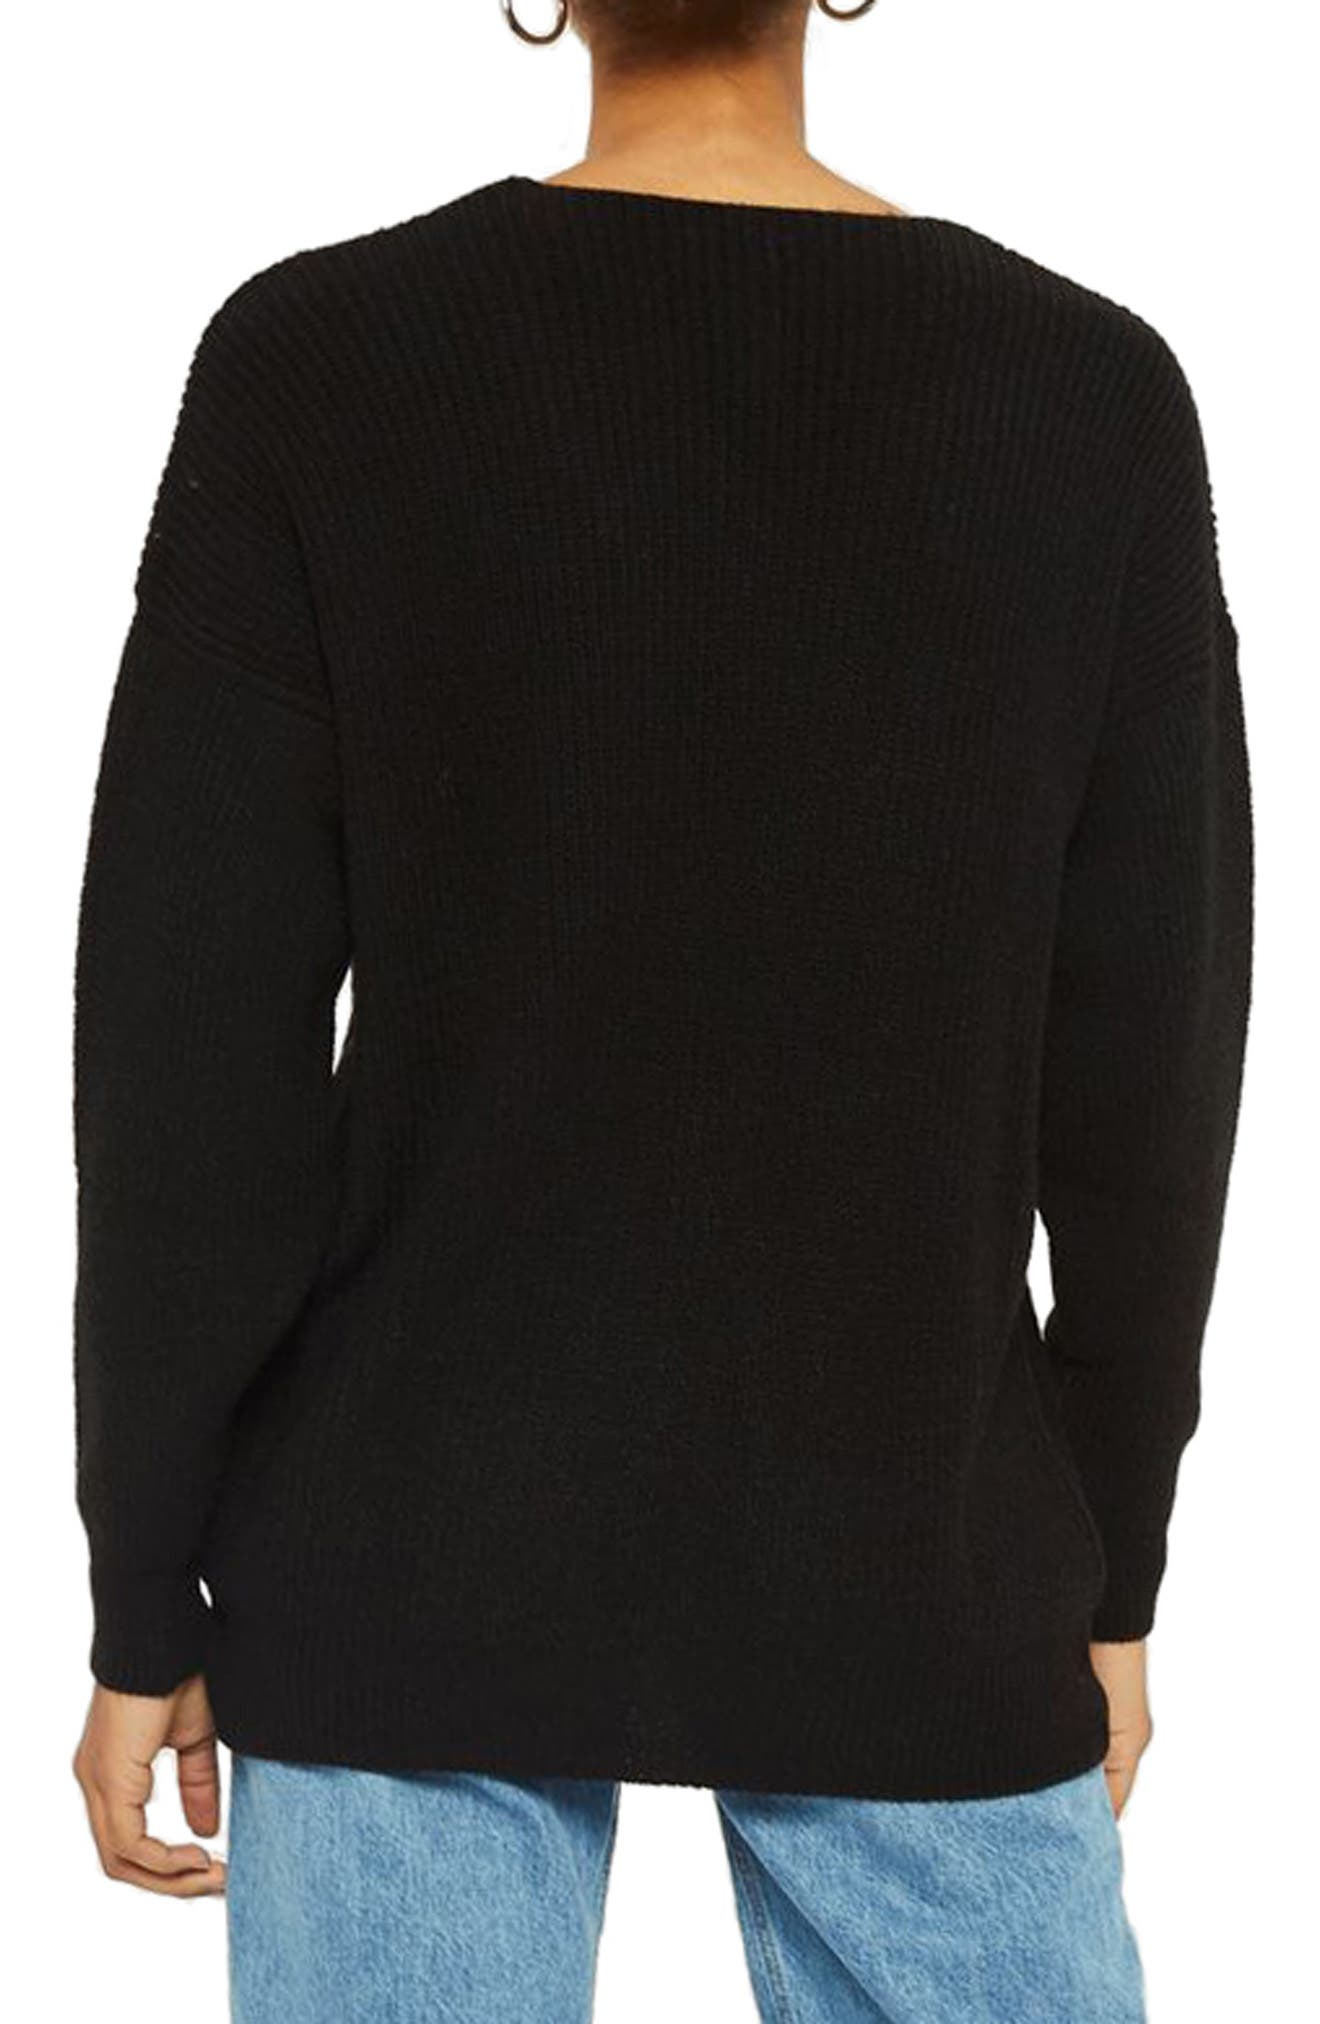 Ladder Stitch Sweater,                             Alternate thumbnail 2, color,                             Black